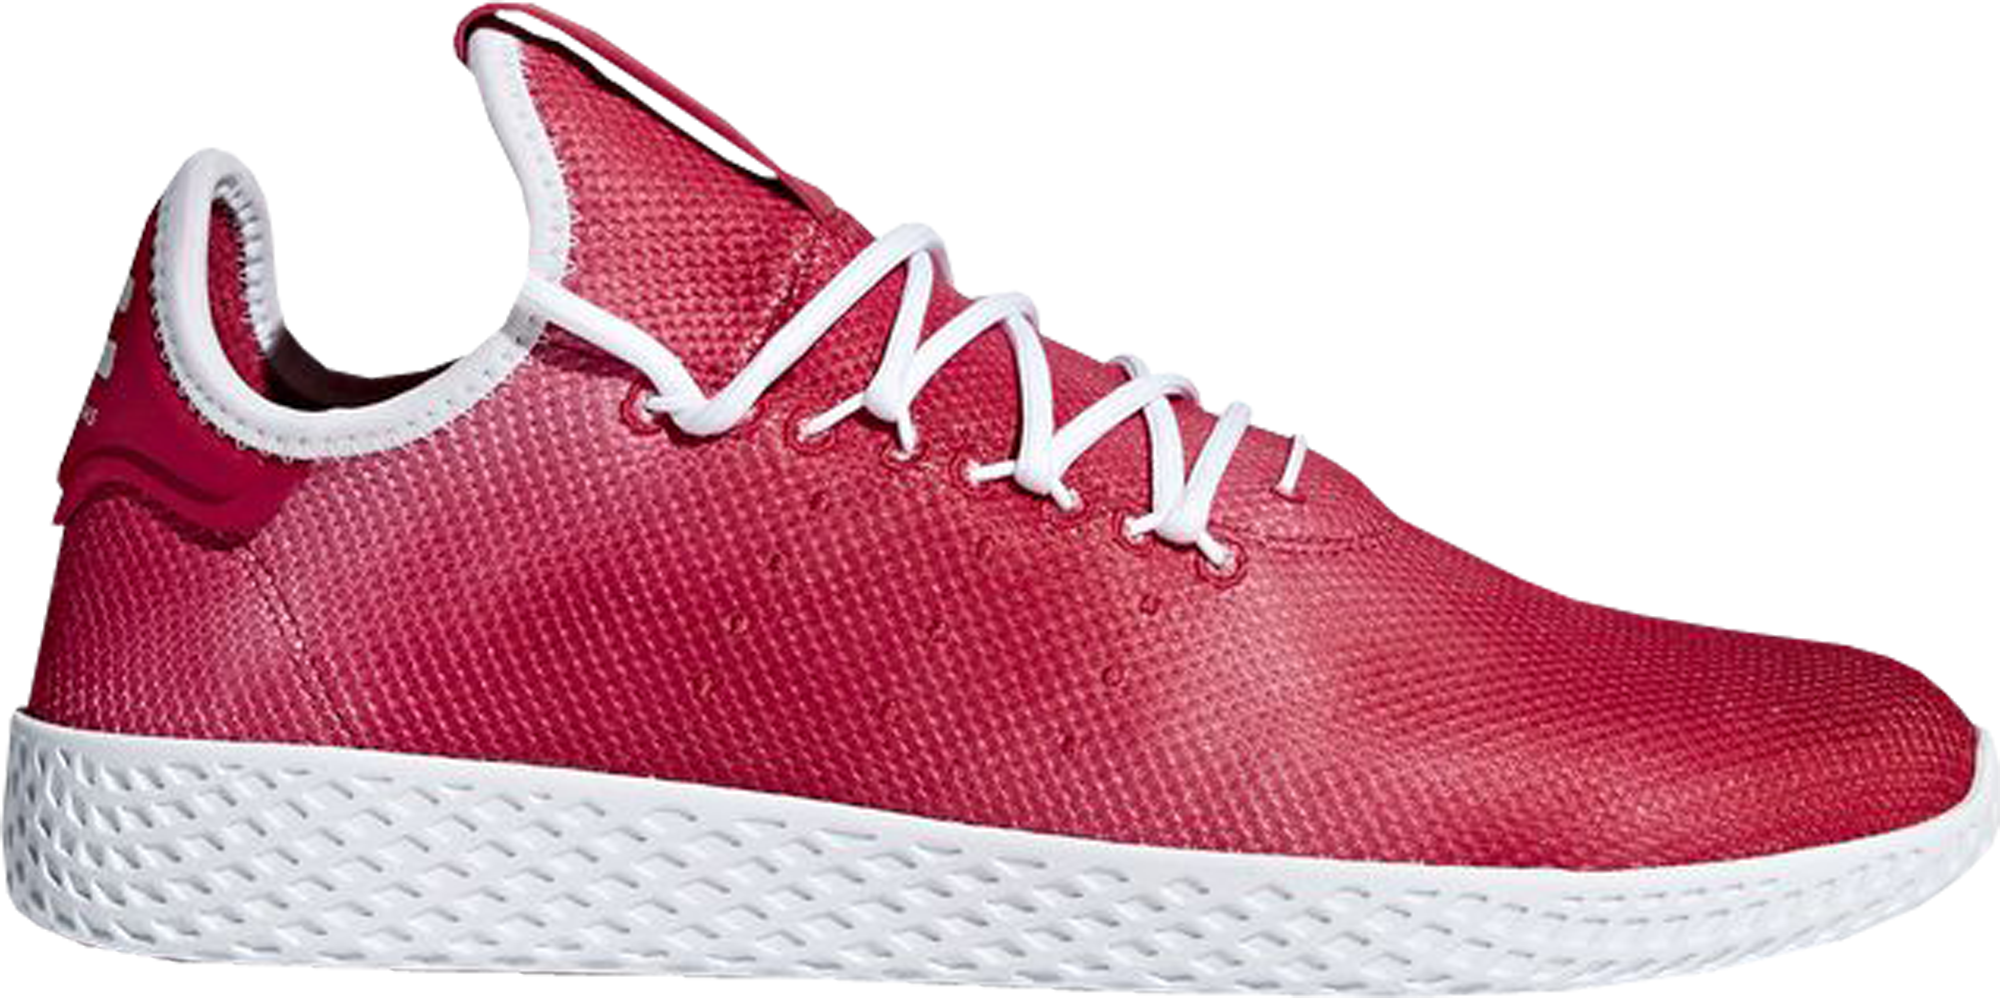 adidas Tennis HU Holi Red